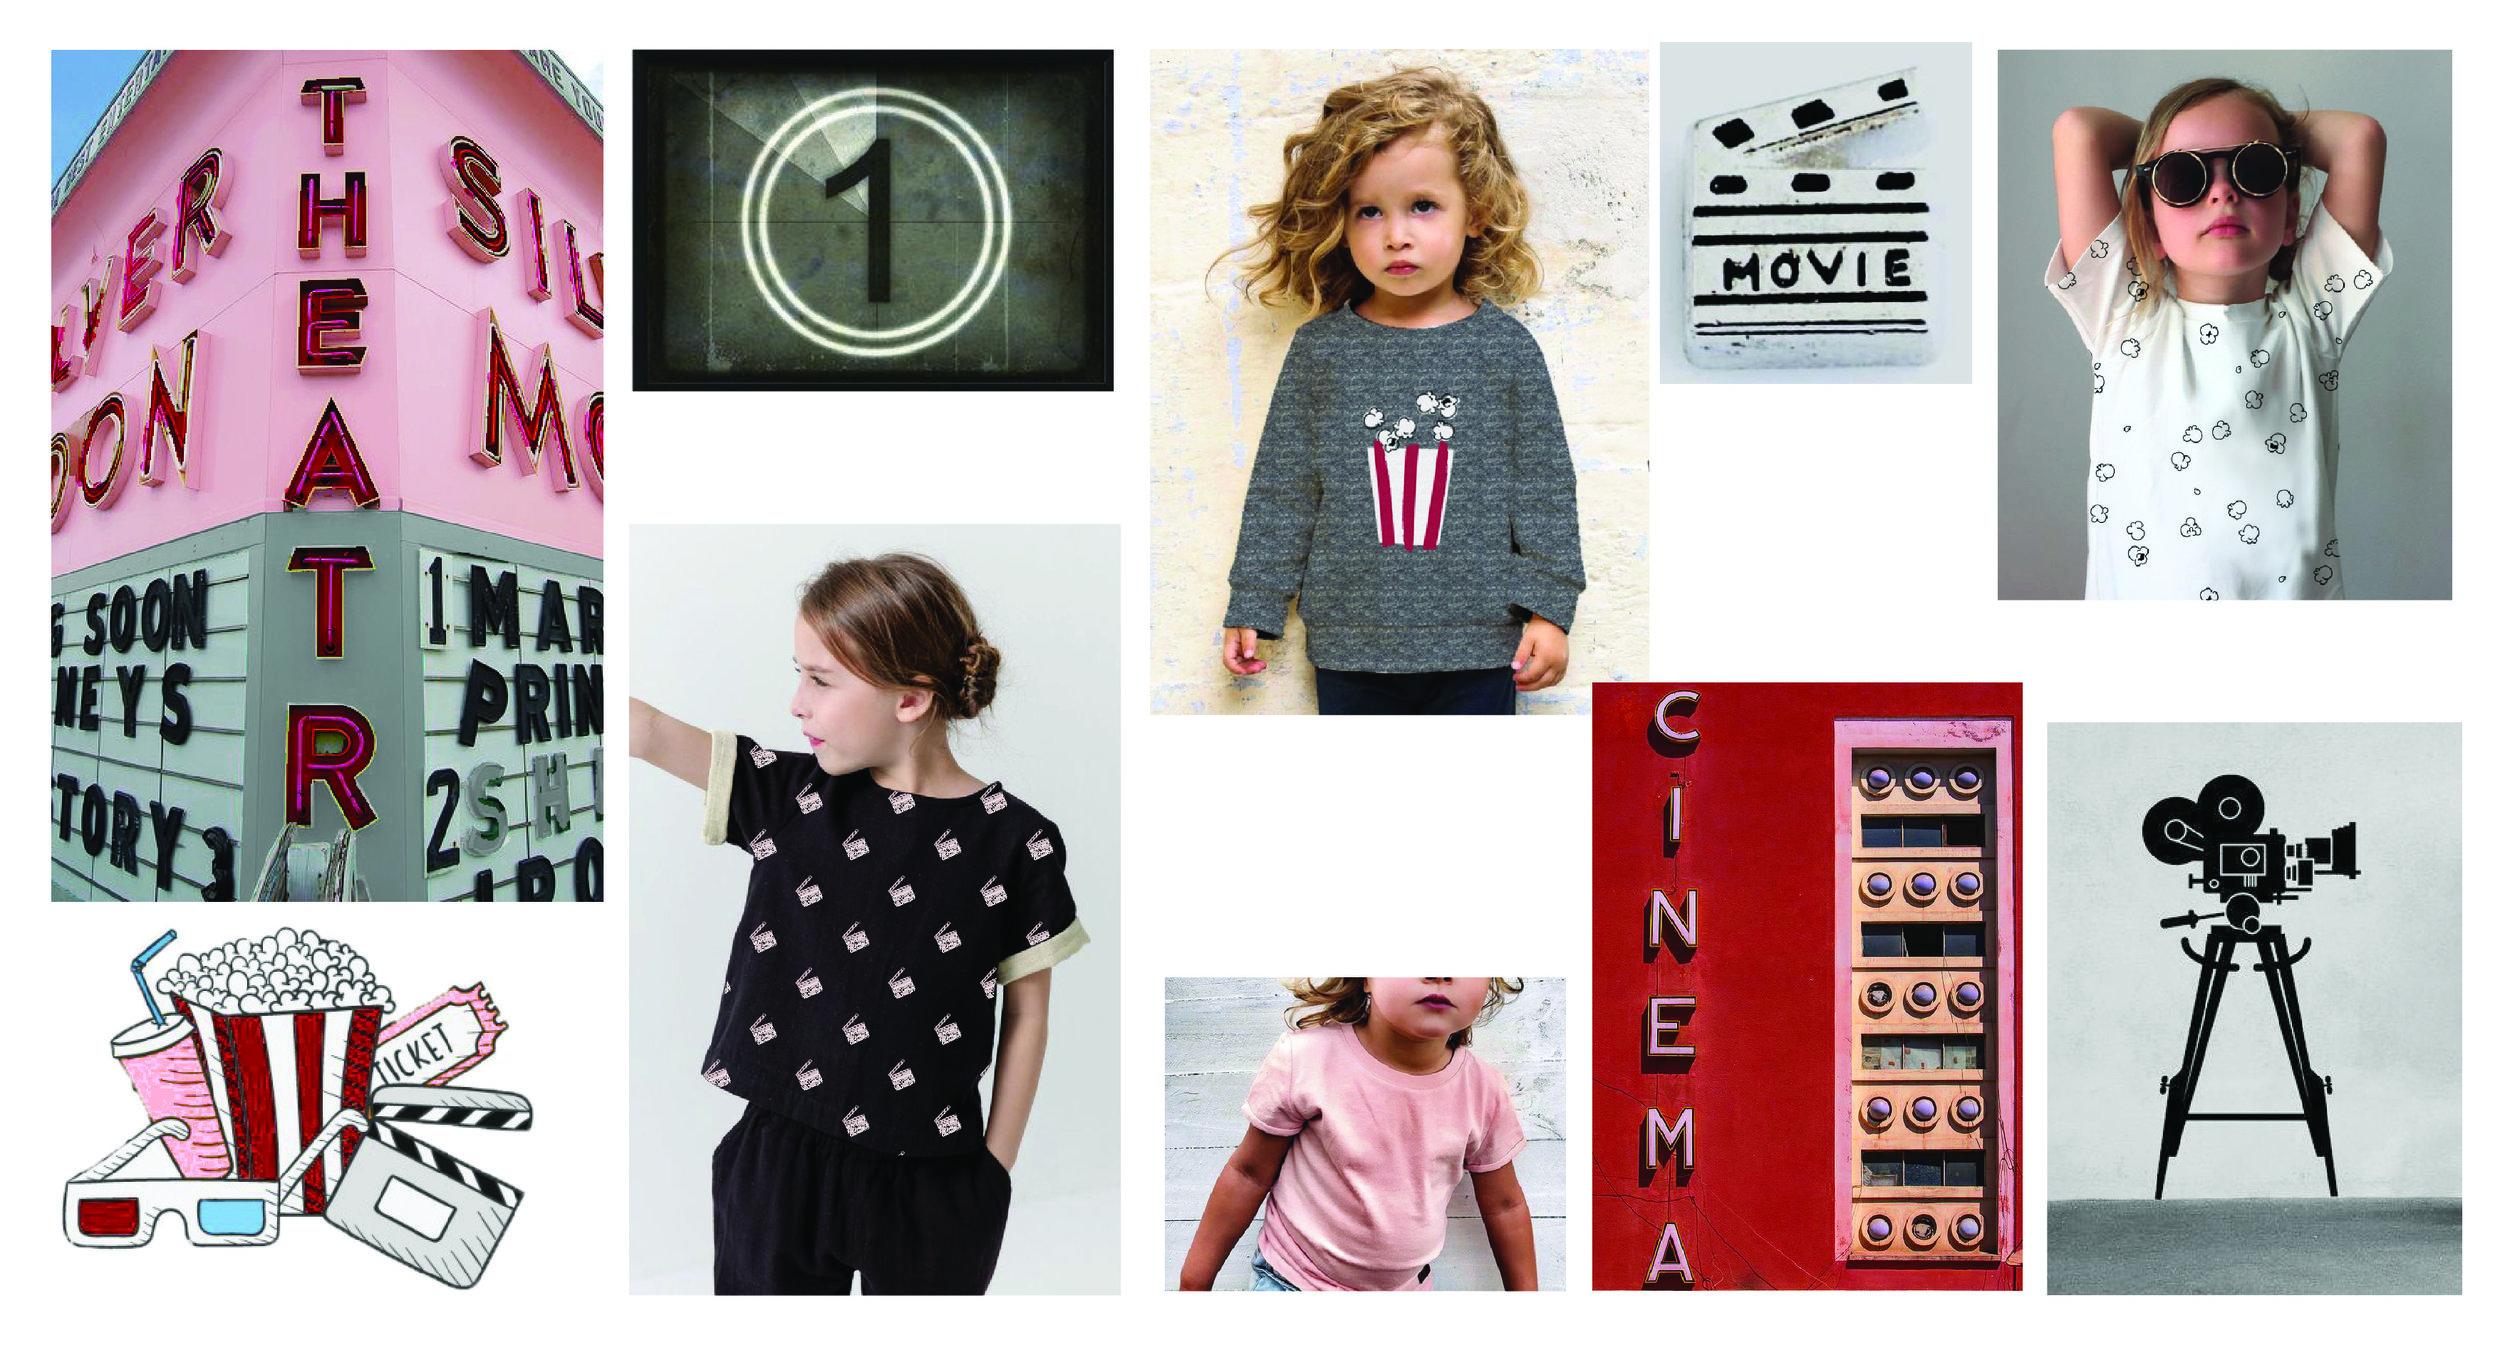 Miles Baby_Cinema-07.jpg